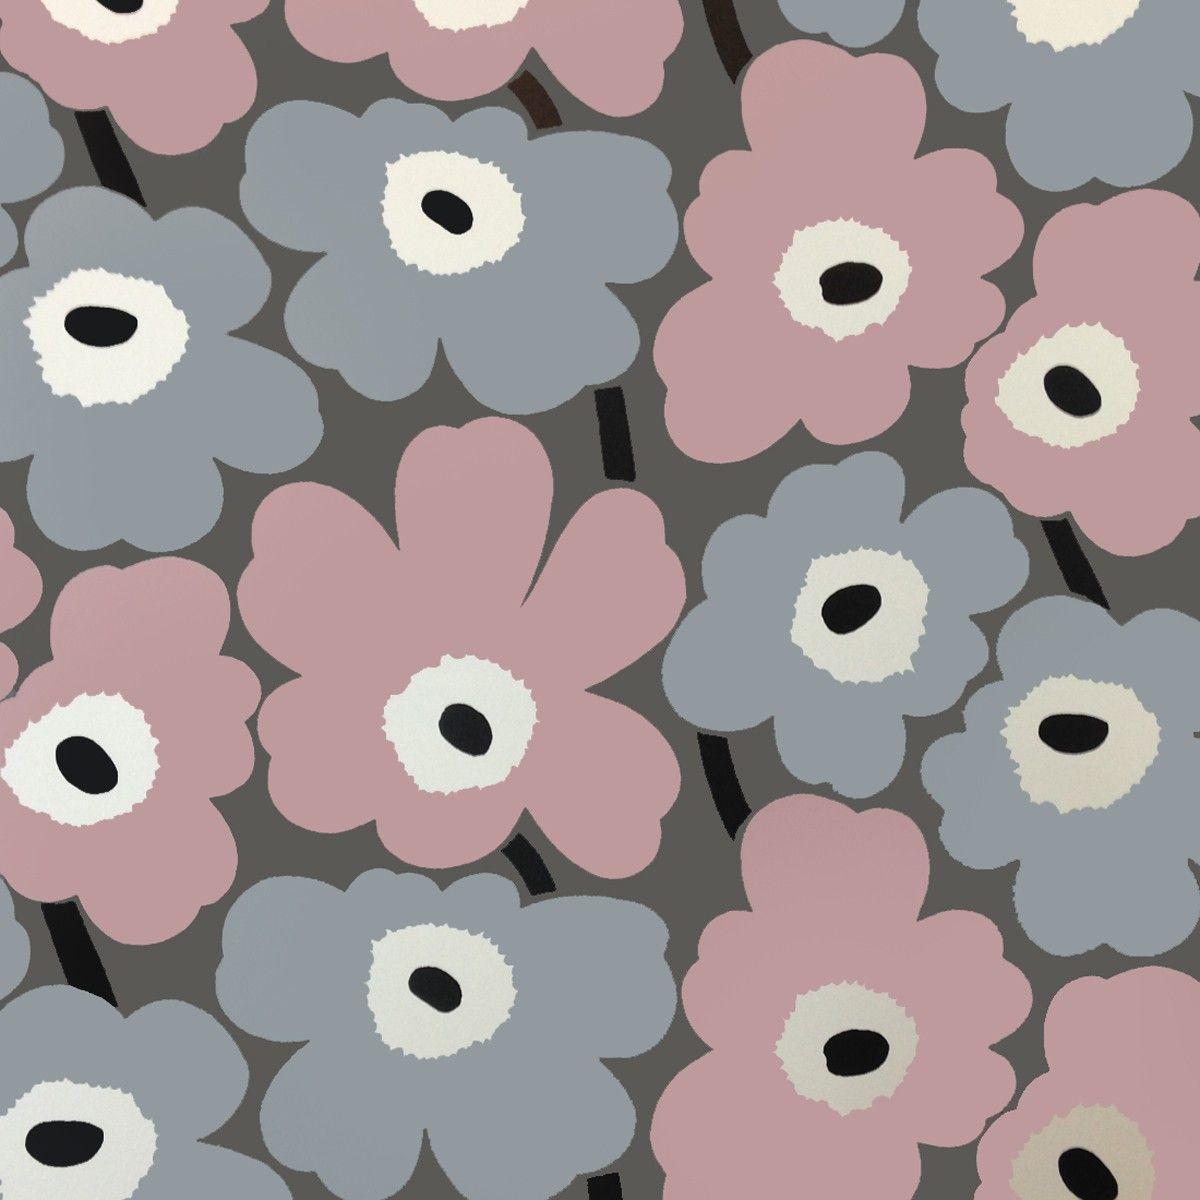 Marimekko Pieni Unikko Wallpaper Marimekko Wallpaper